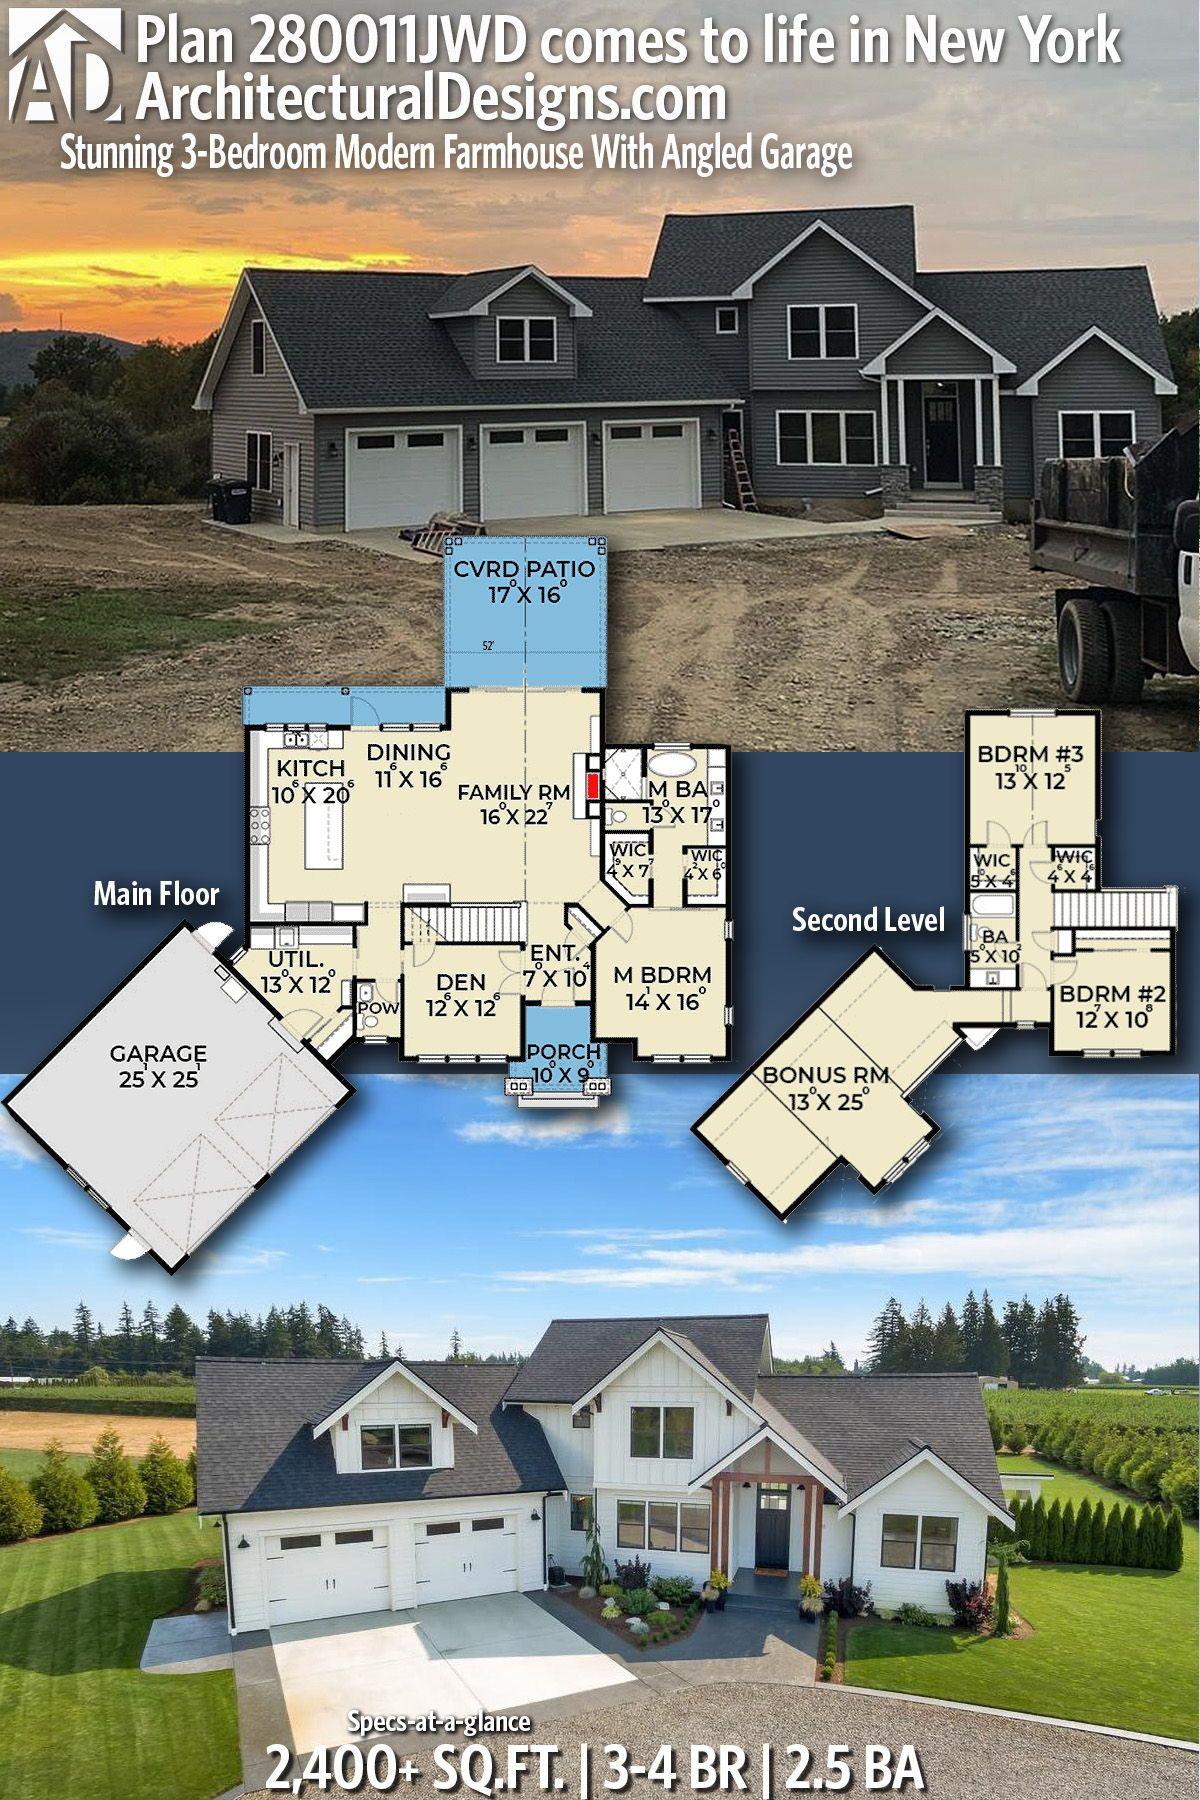 Plan 280011jwd Stunning 3 Bedroom Modern Farmhouse With Angled Garage Modern Farmhouse Exterior Barn House Plans Modern Farmhouse Plans